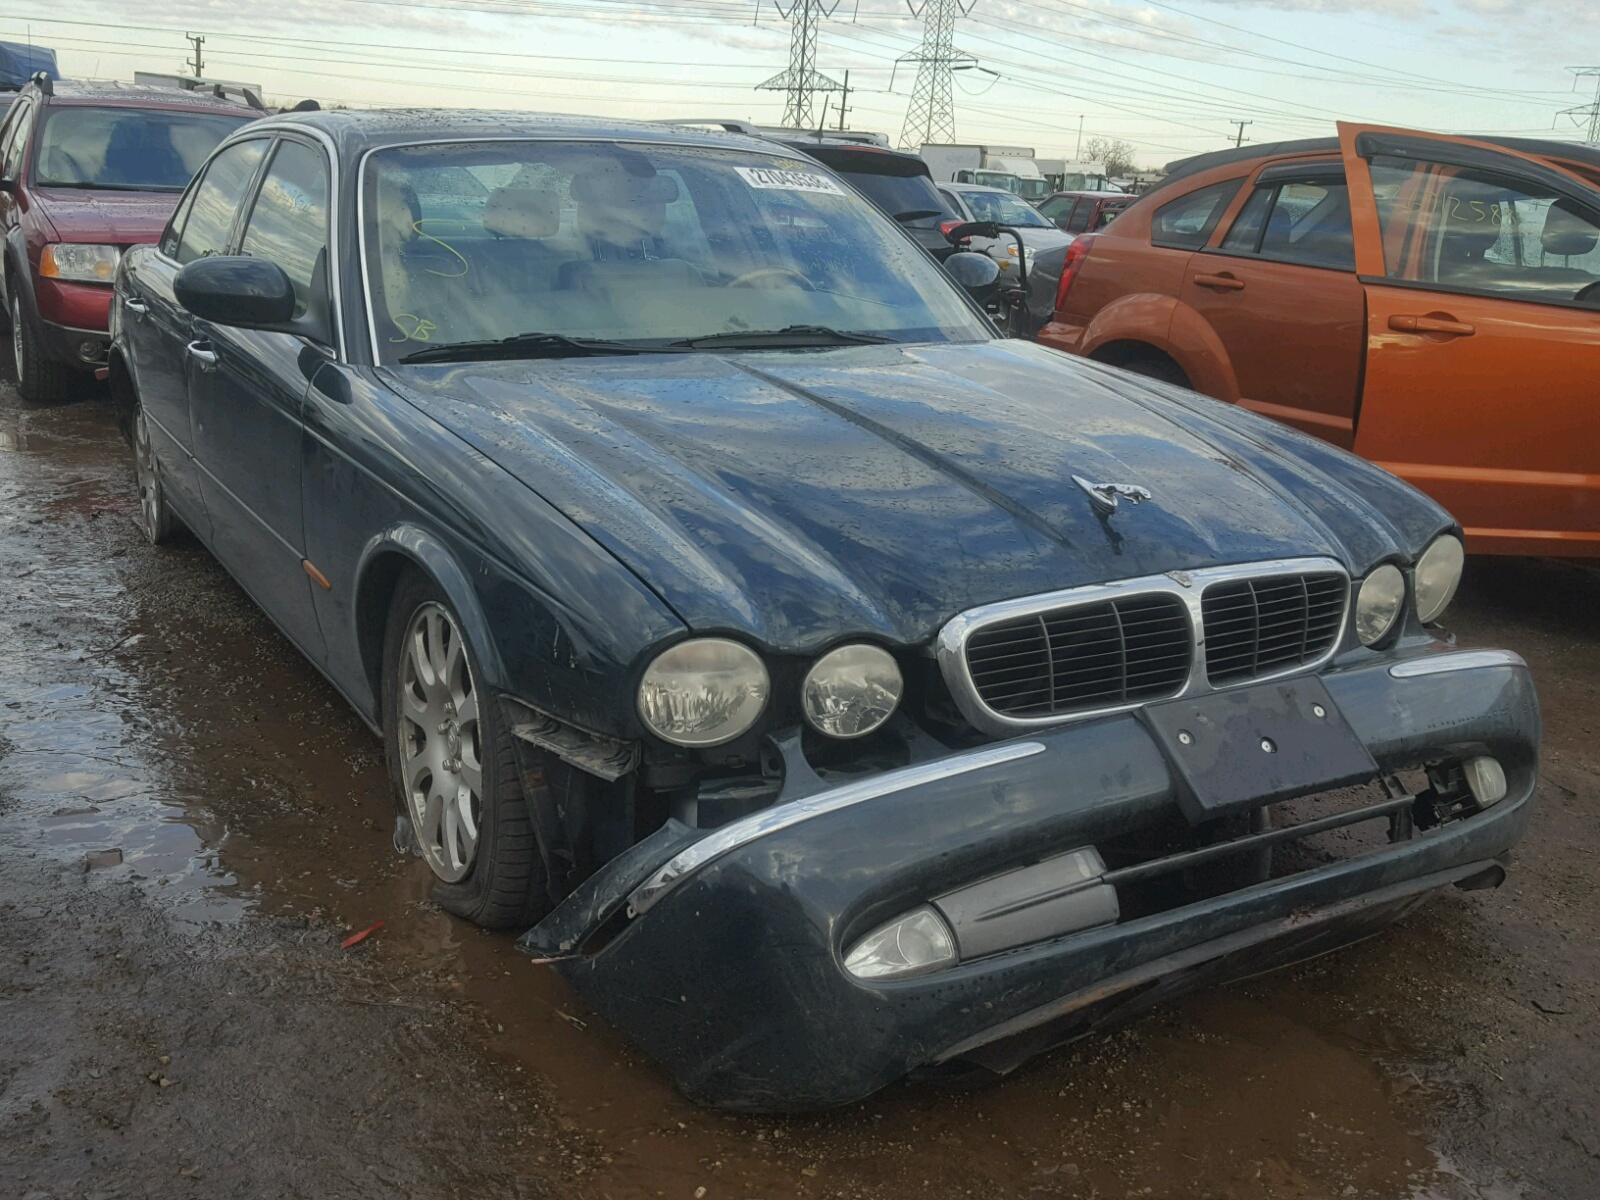 com of classiccars listings for large auction sale online jaguar picture in c cc std view